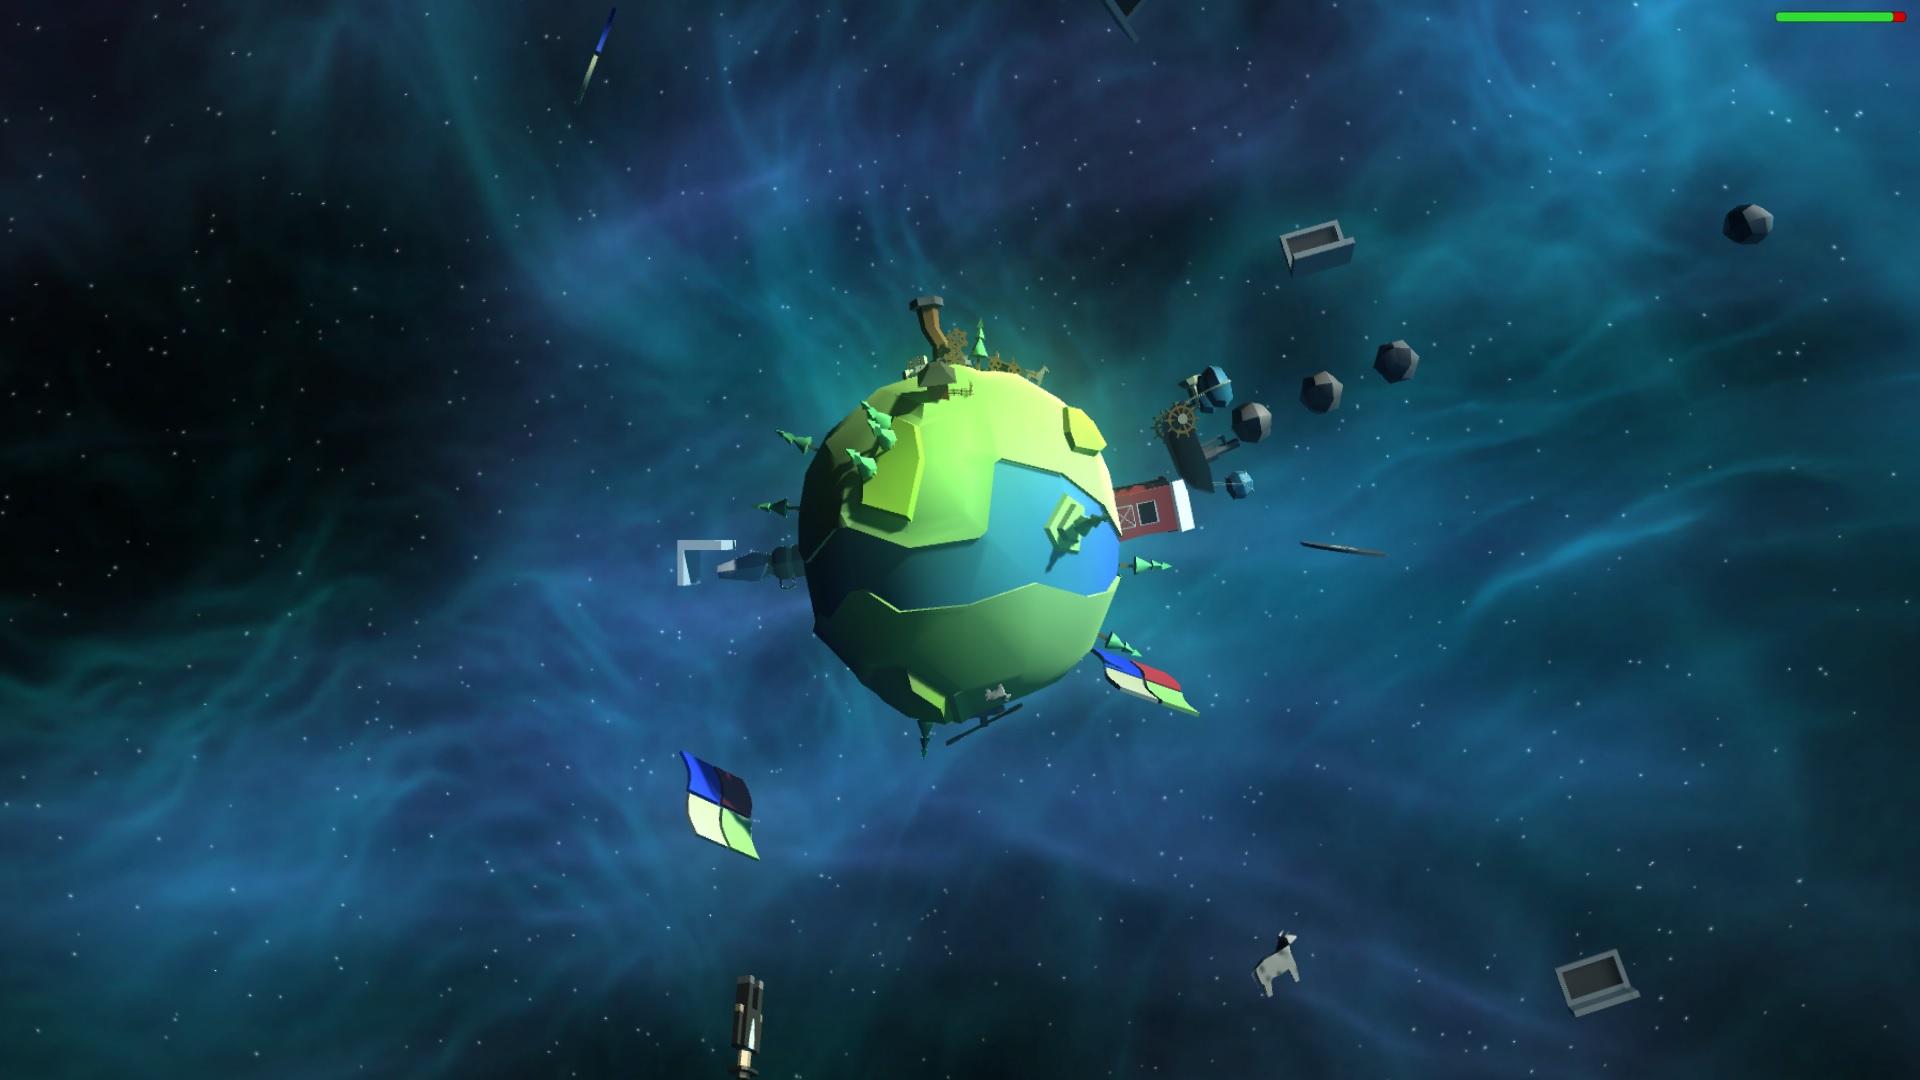 Captura de pantalla del videojuego Amish Paradise